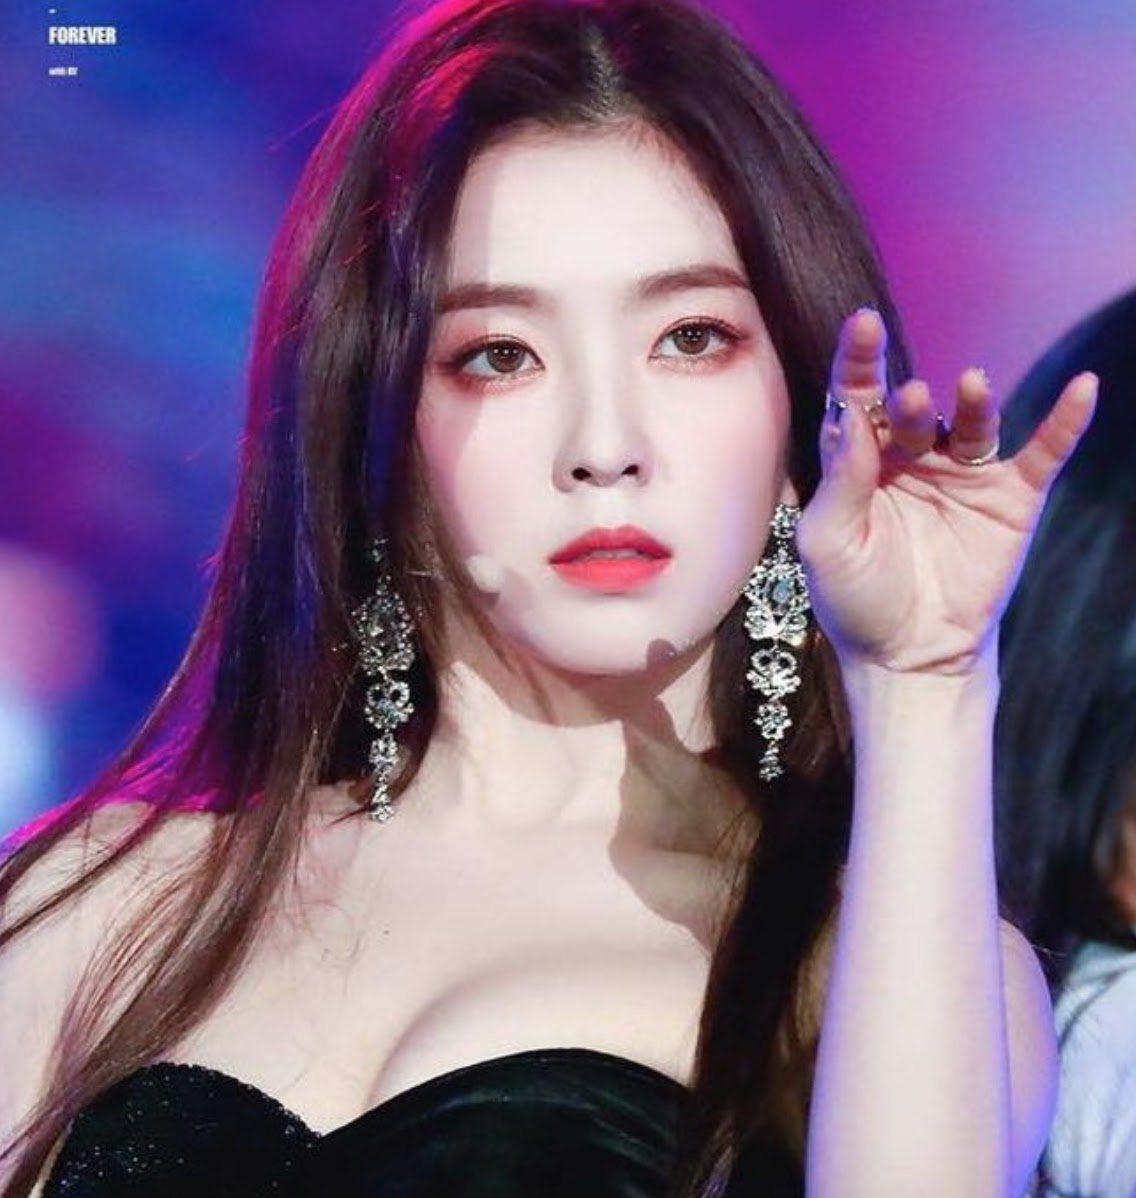 Red Velvet裴珠泫的脸在网上成为最受欢迎的整容模板